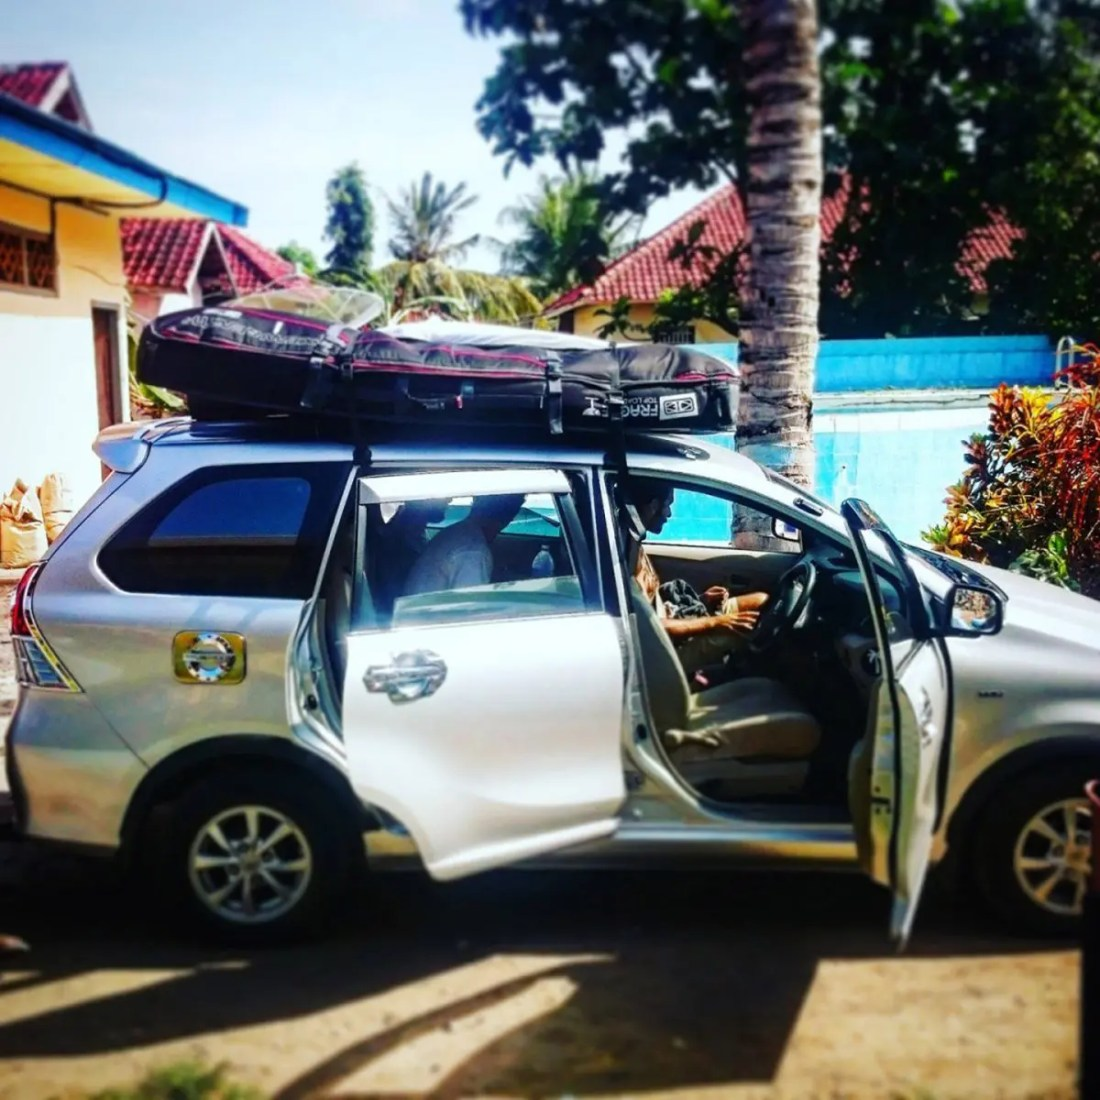 Coche surf Sumbawa, Indonesia, Sudeste Asiático @tiempodexplorar 2016